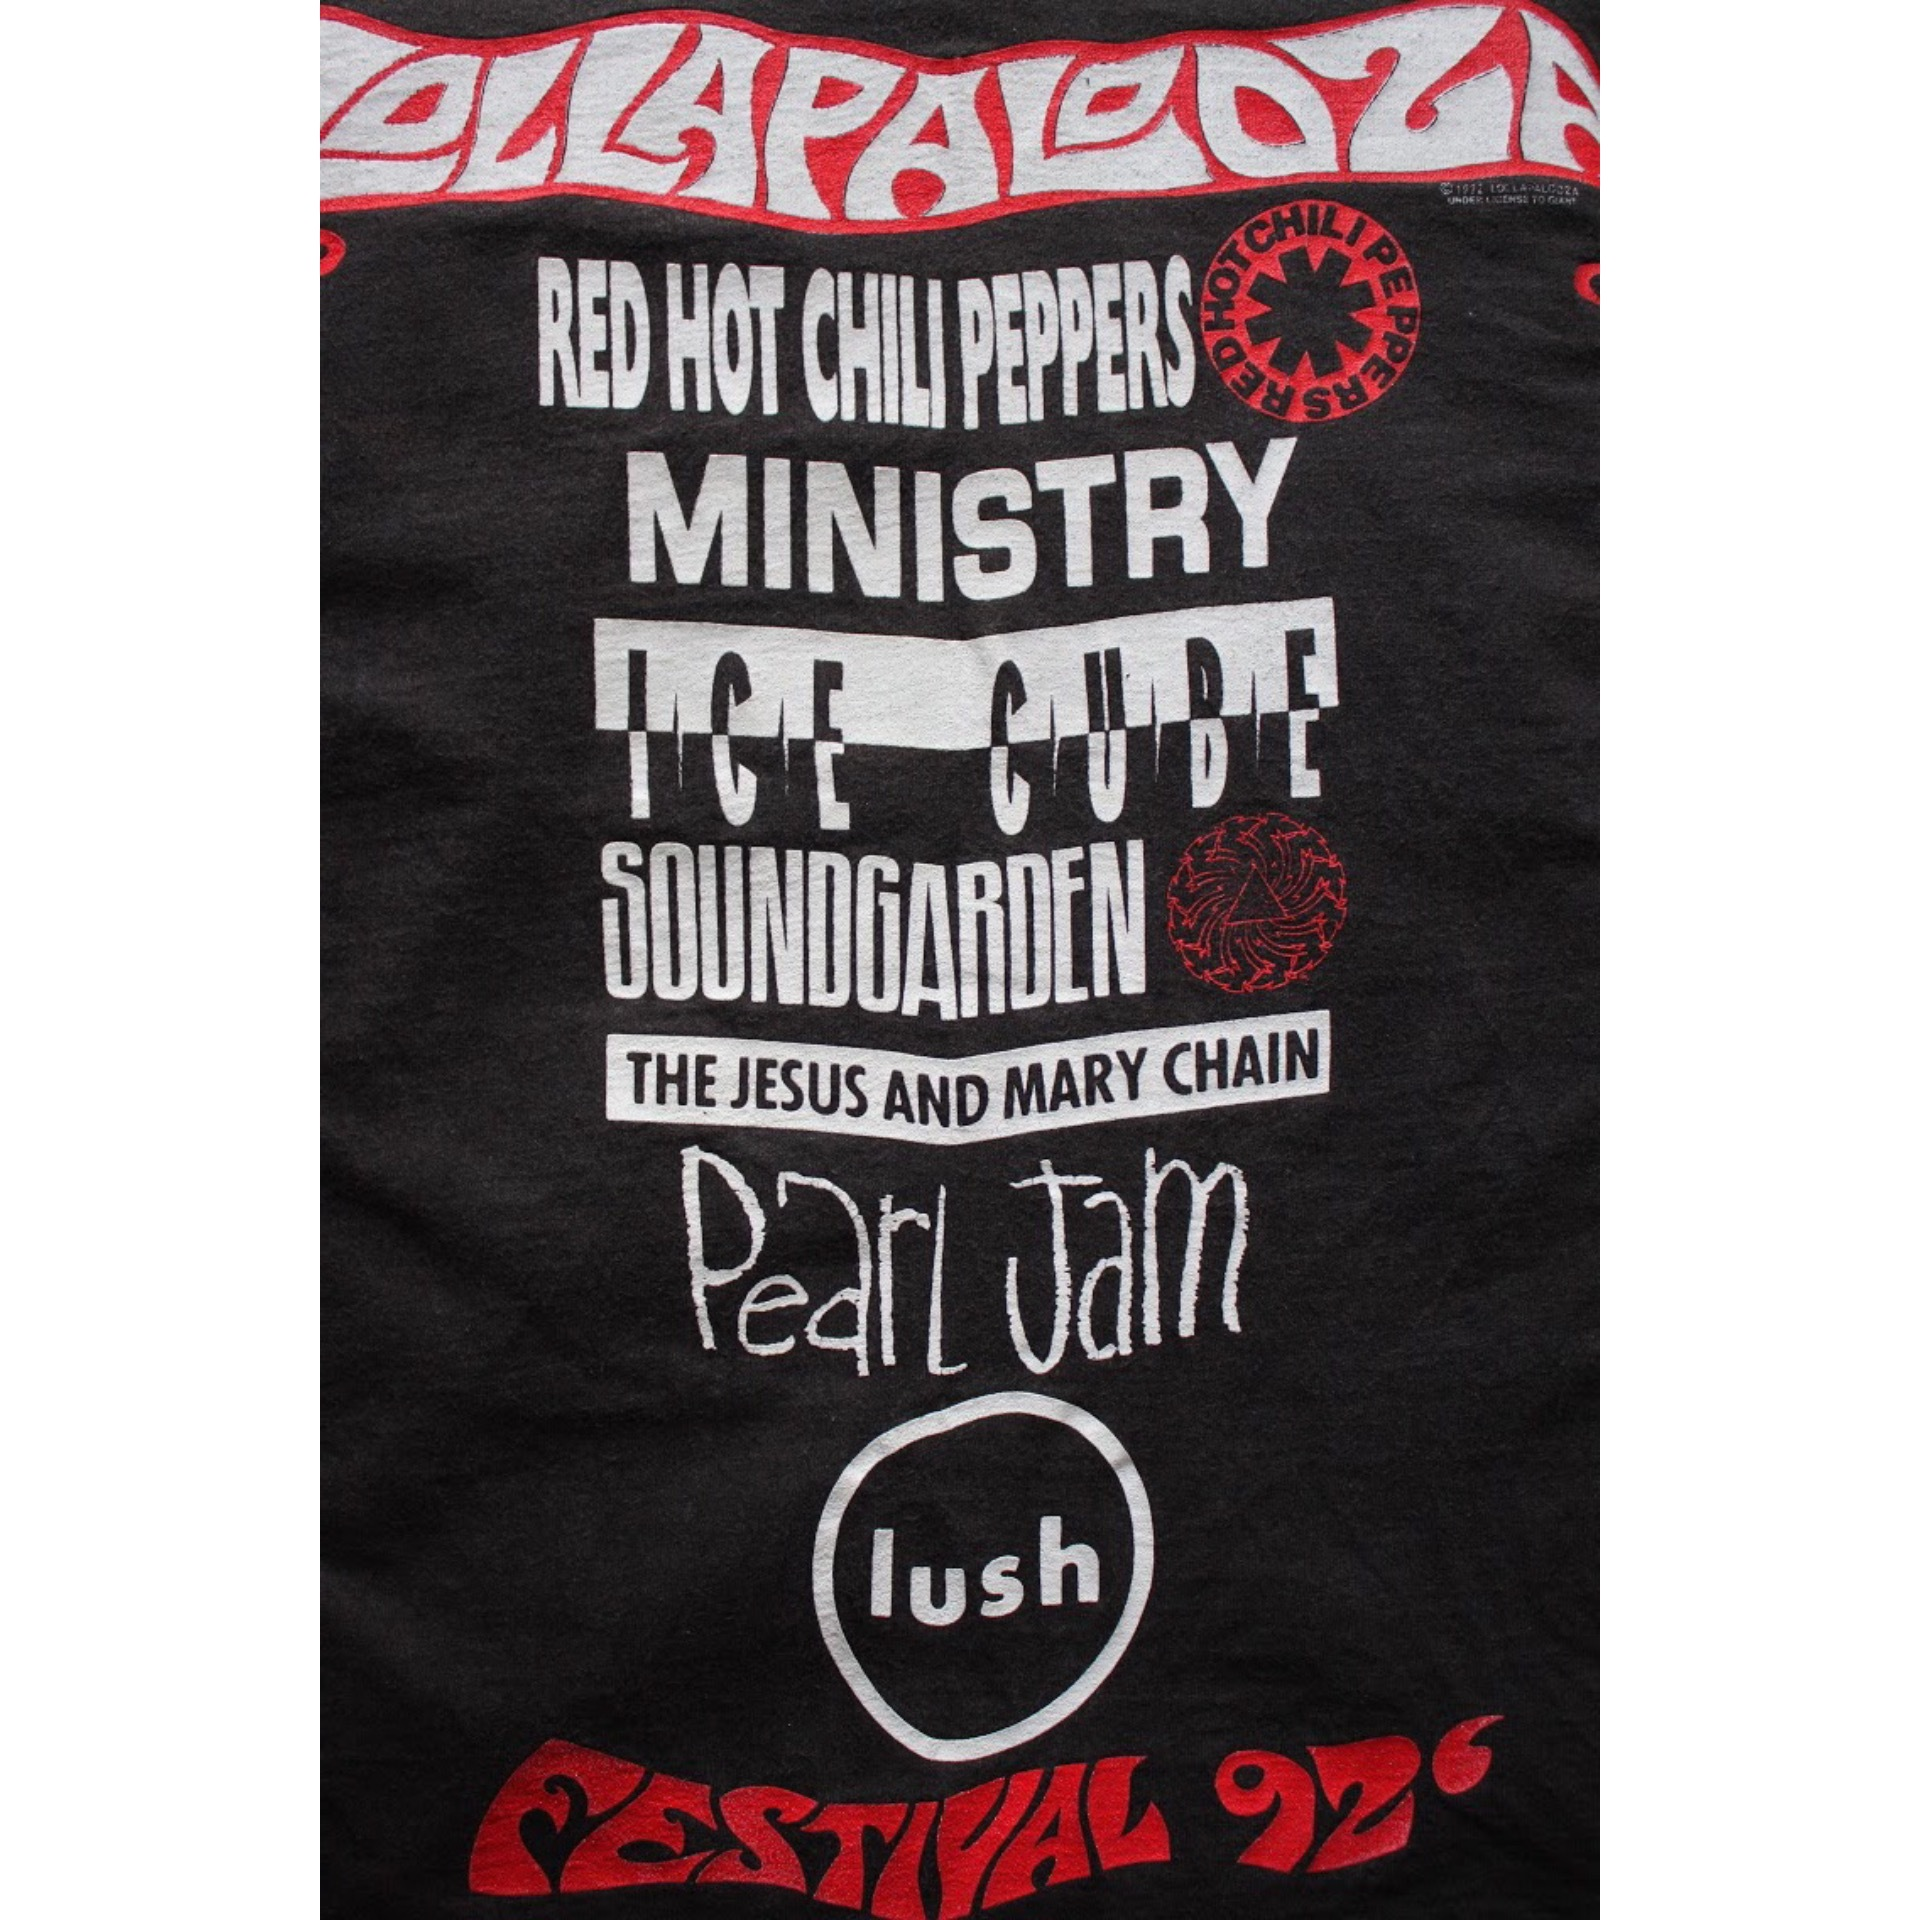 Vintage Lollapalooza Festival 92 t shirt